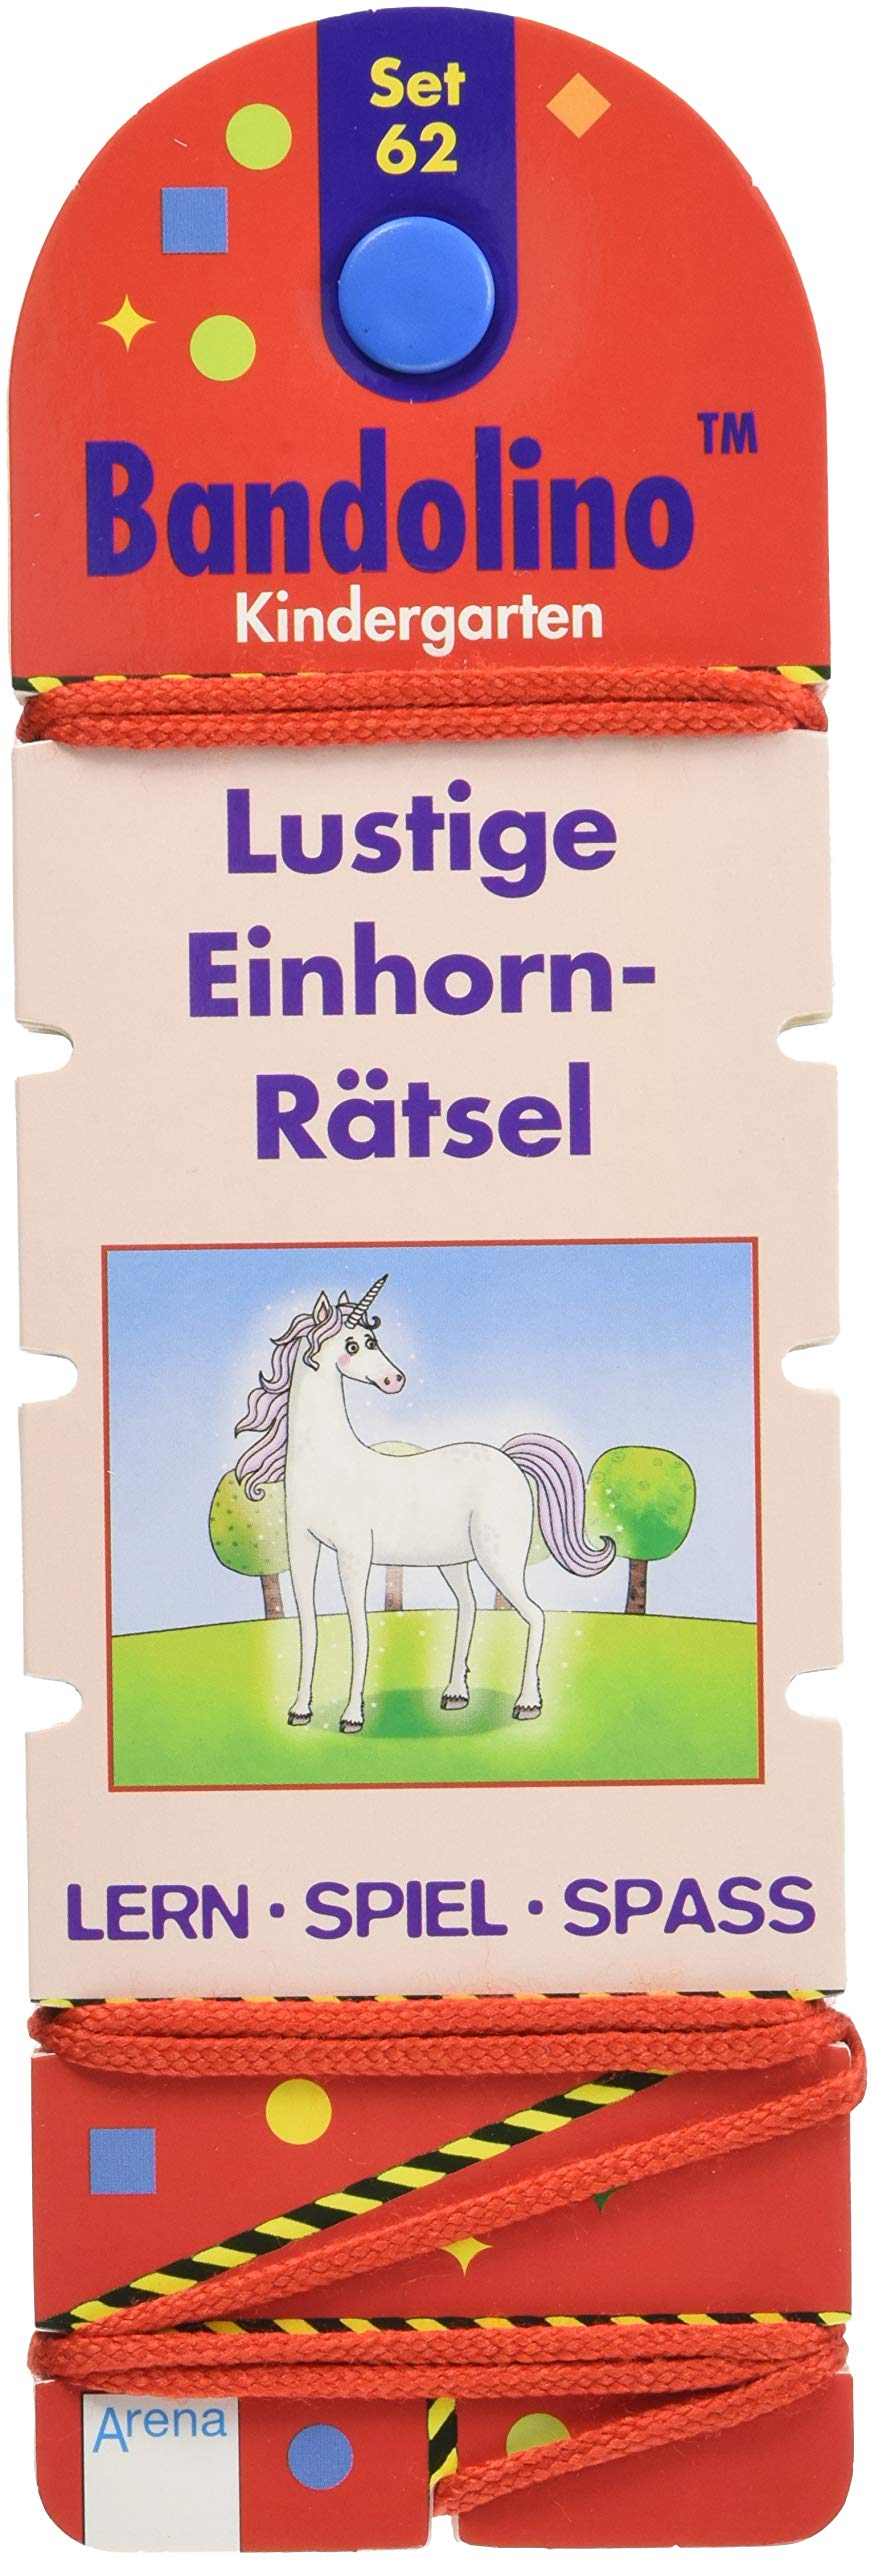 Lustige Einhorn-Rätsel: Bandolino Set 62